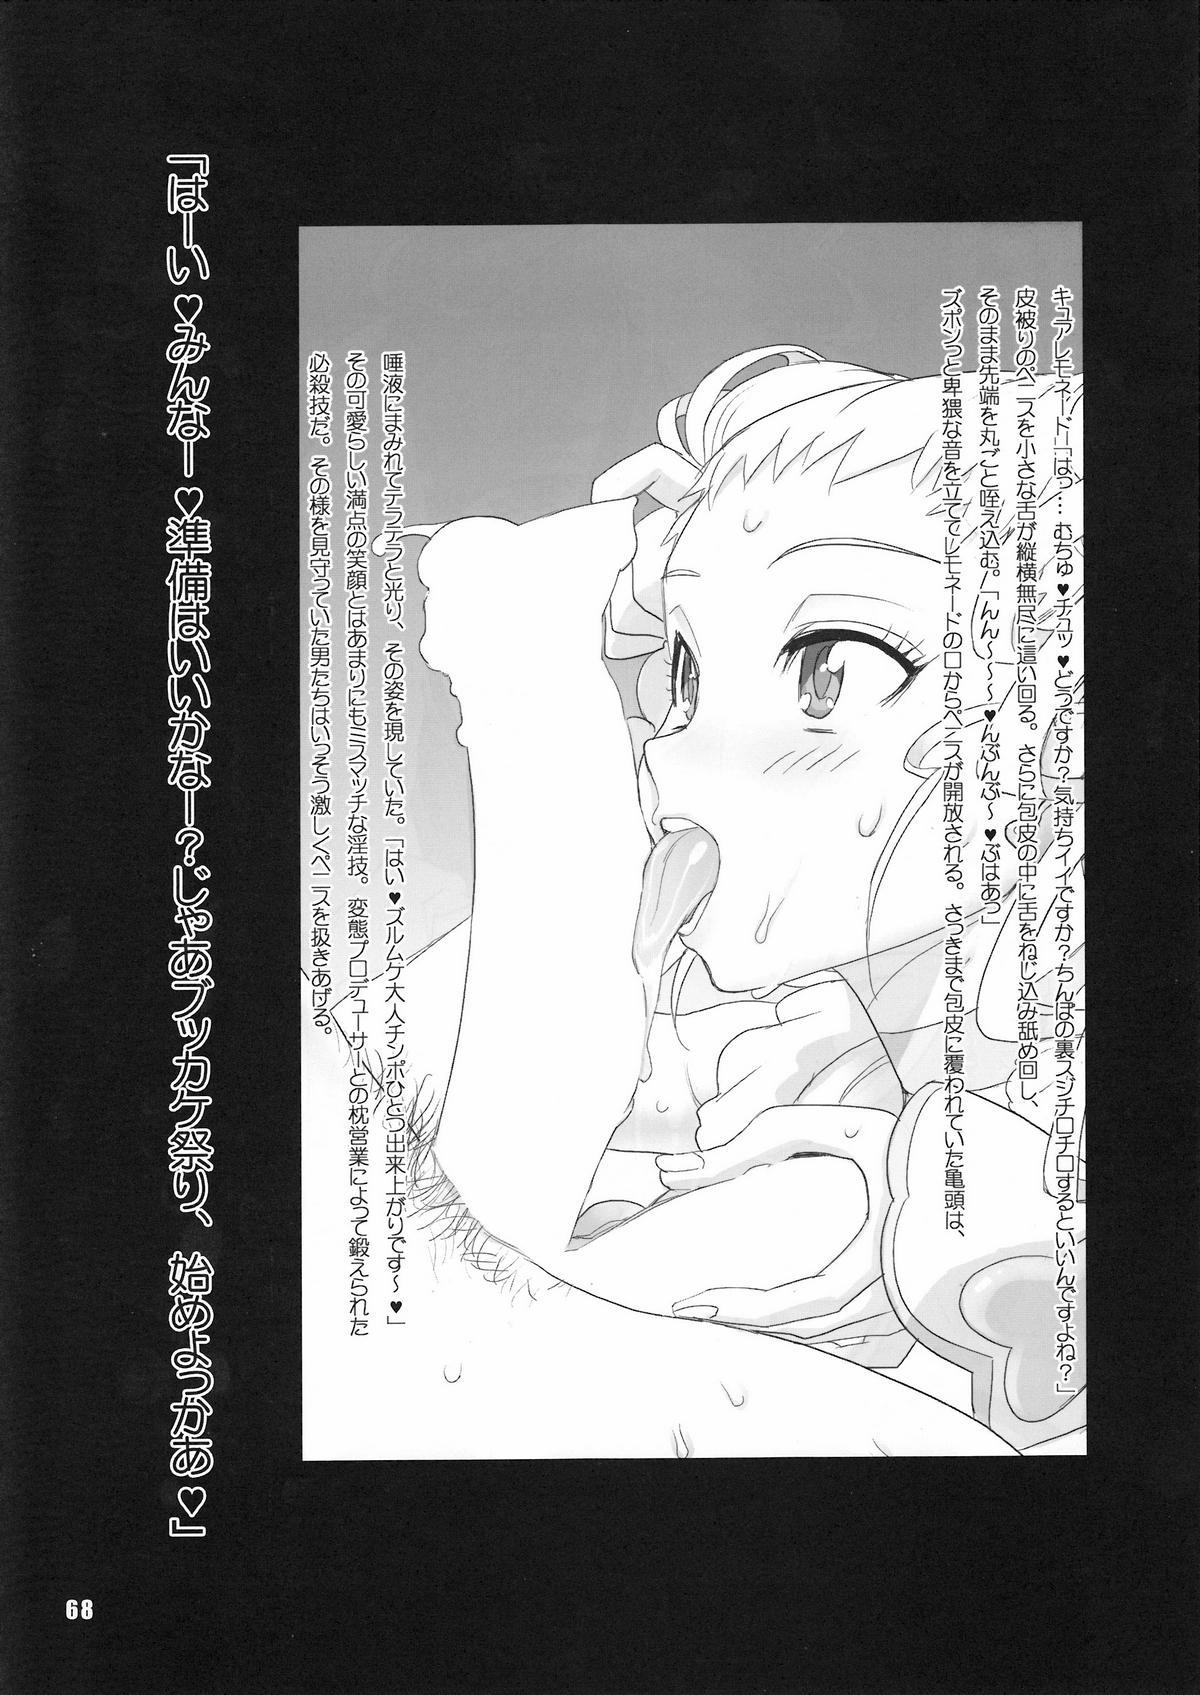 Inazuma Pretty Warrior 65